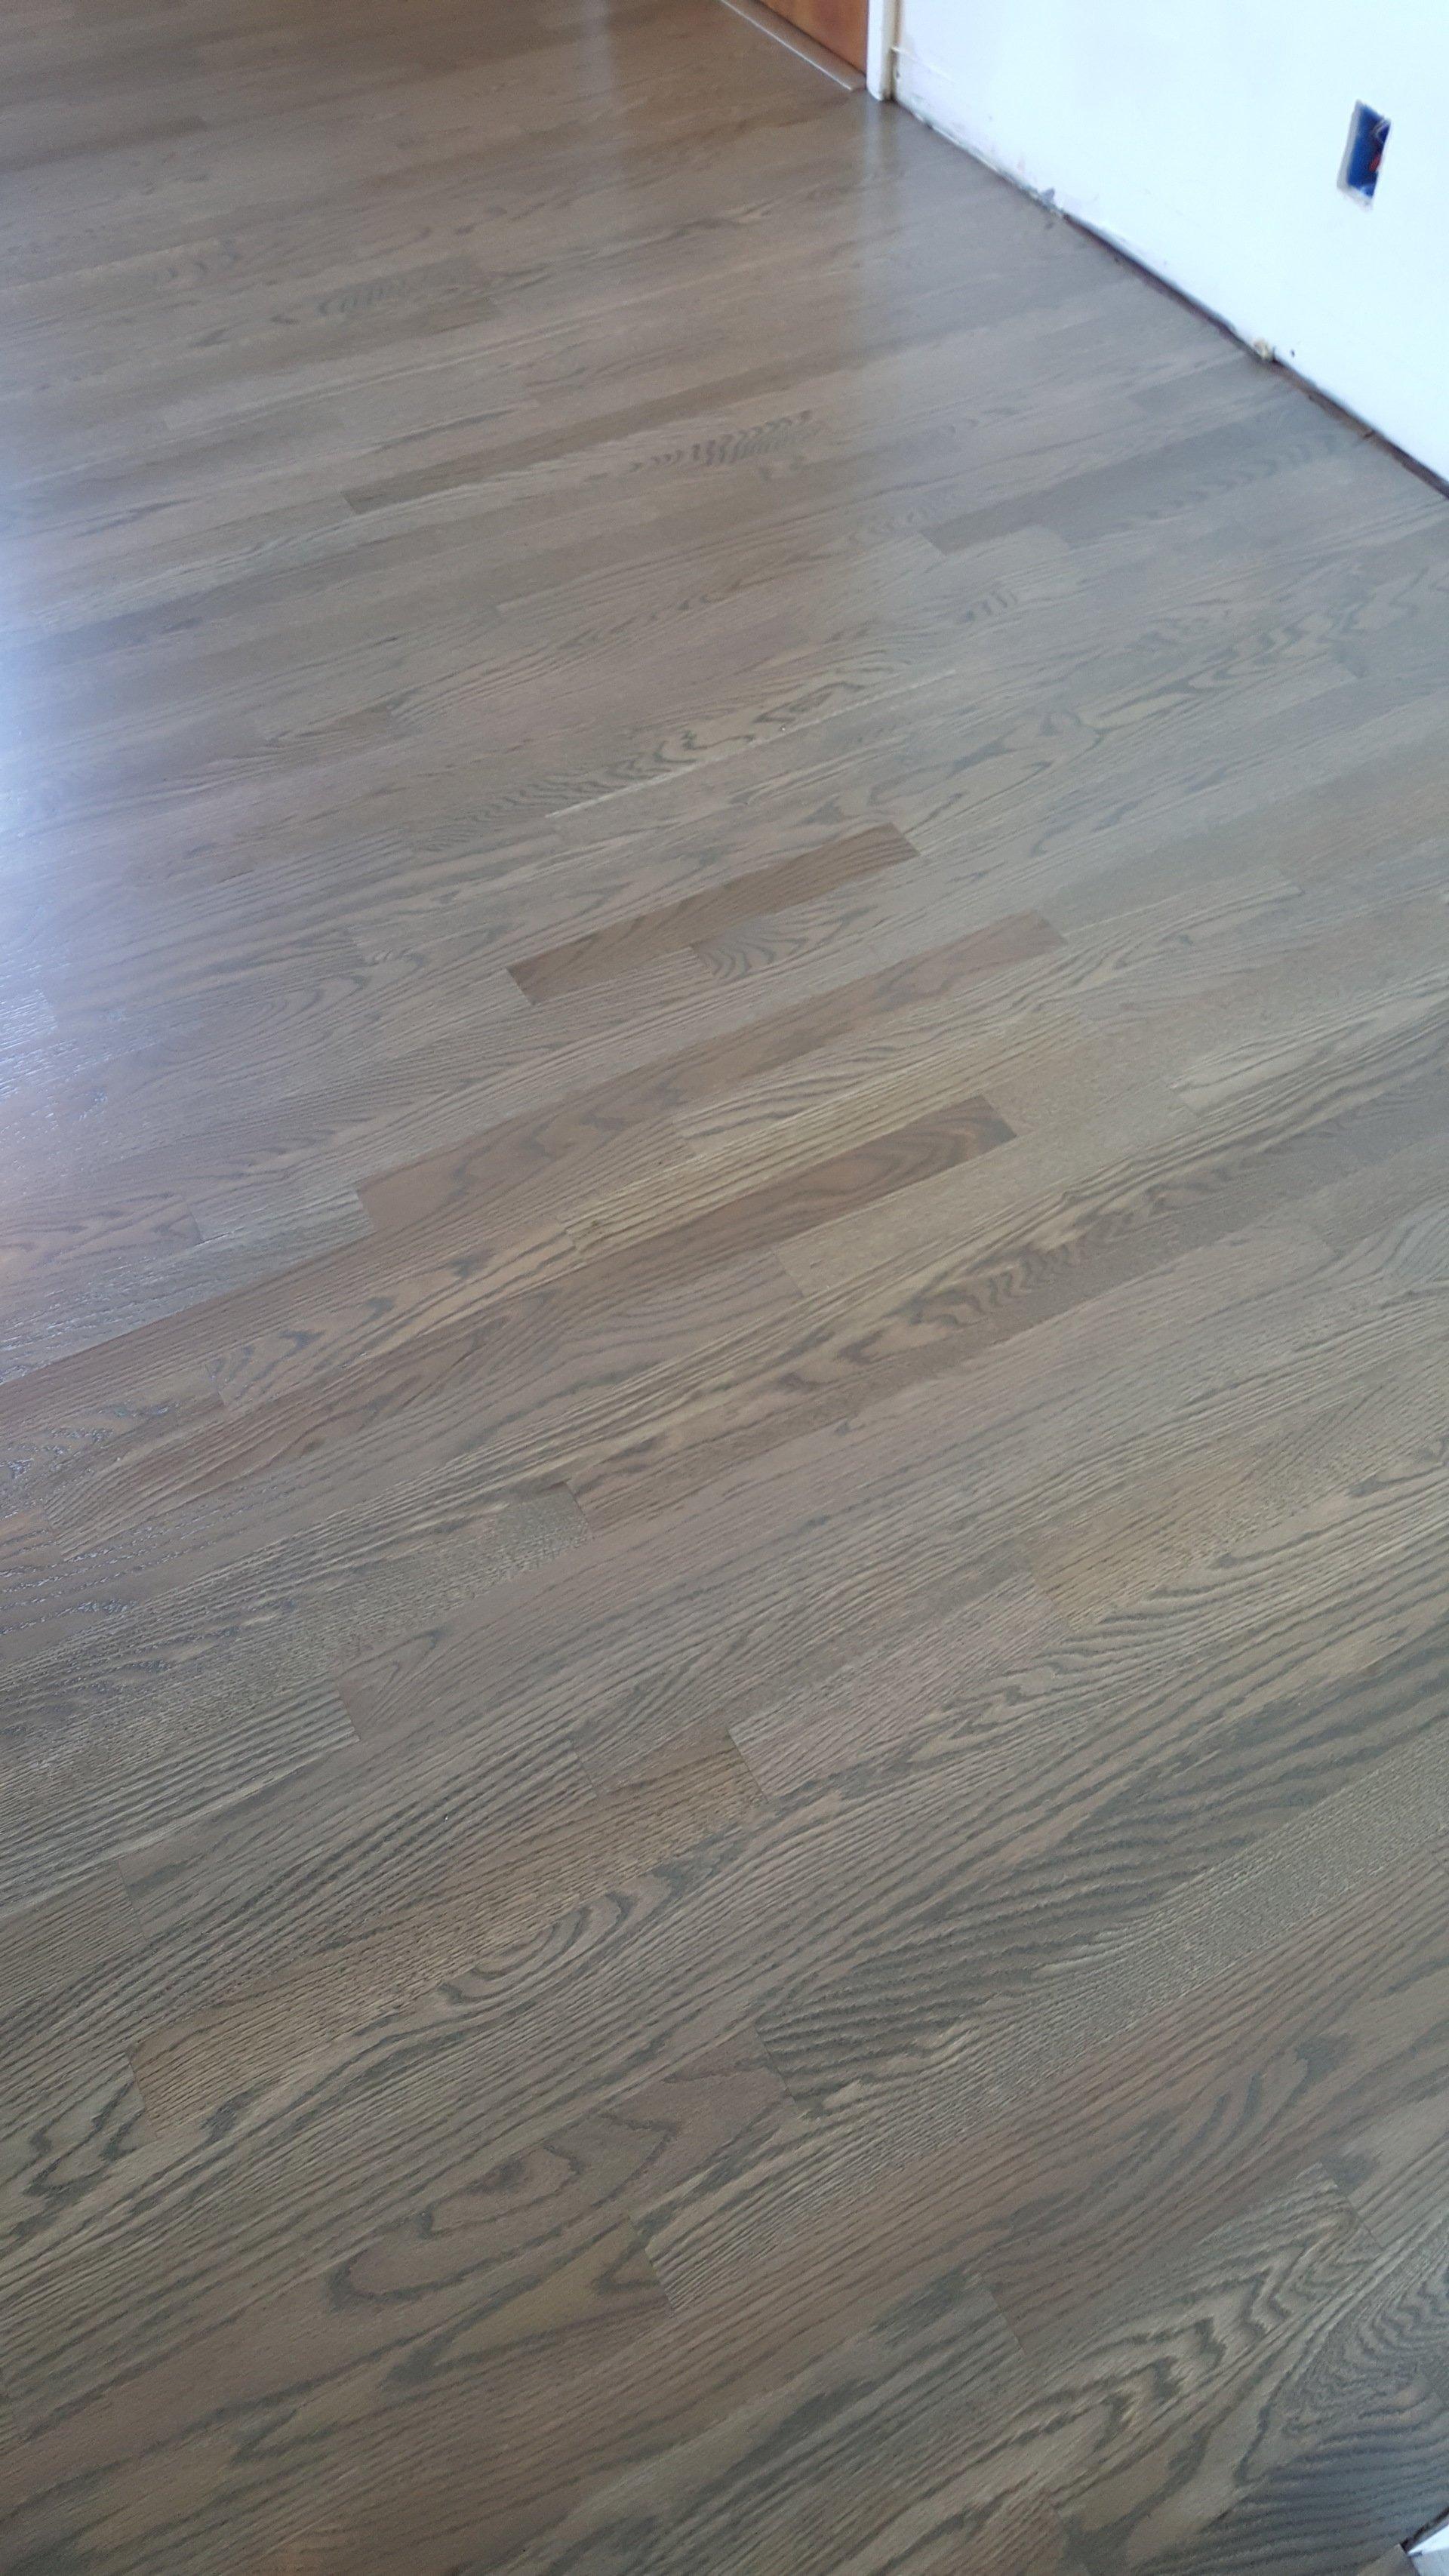 Cramer Hardwood Floors image 0